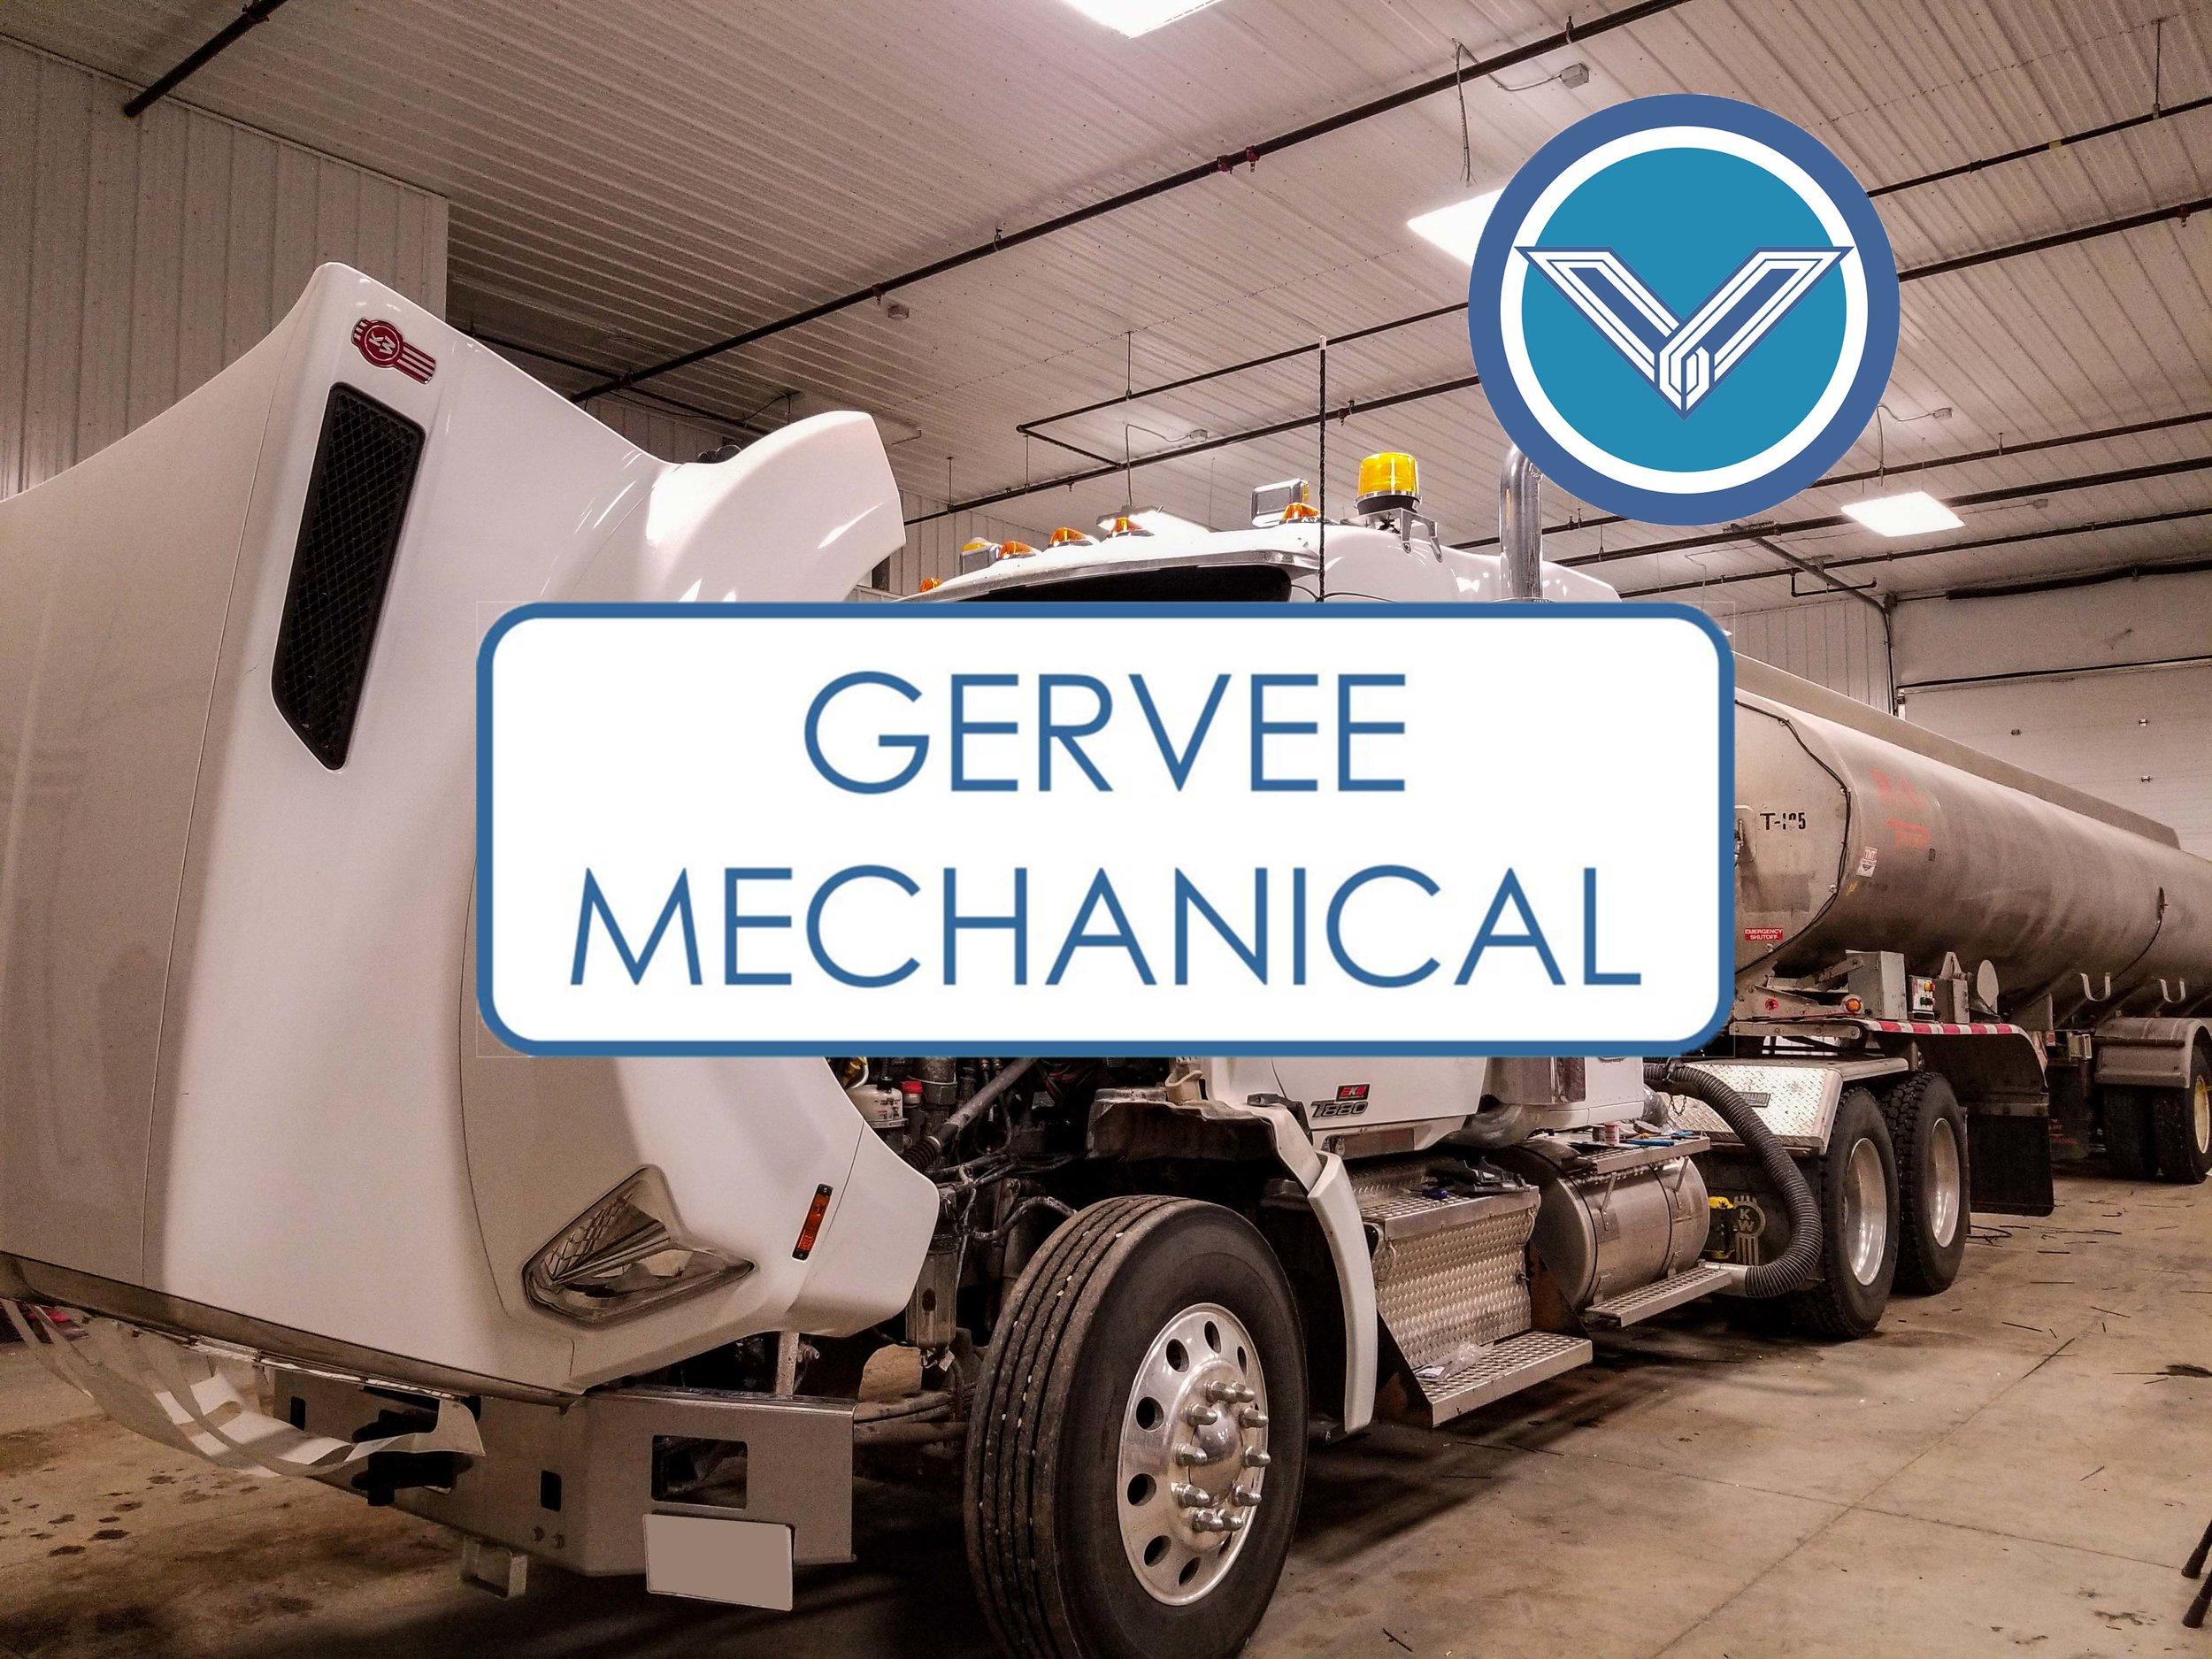 GERVEE is now offering truck and trailer repair.